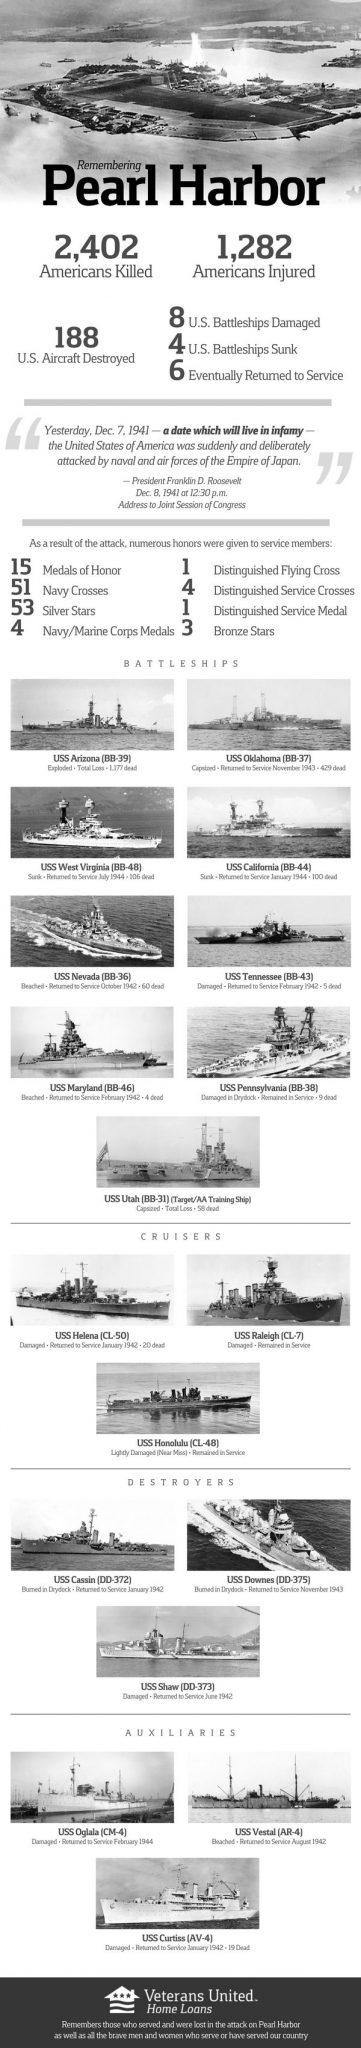 Infografia Pearl Harbor